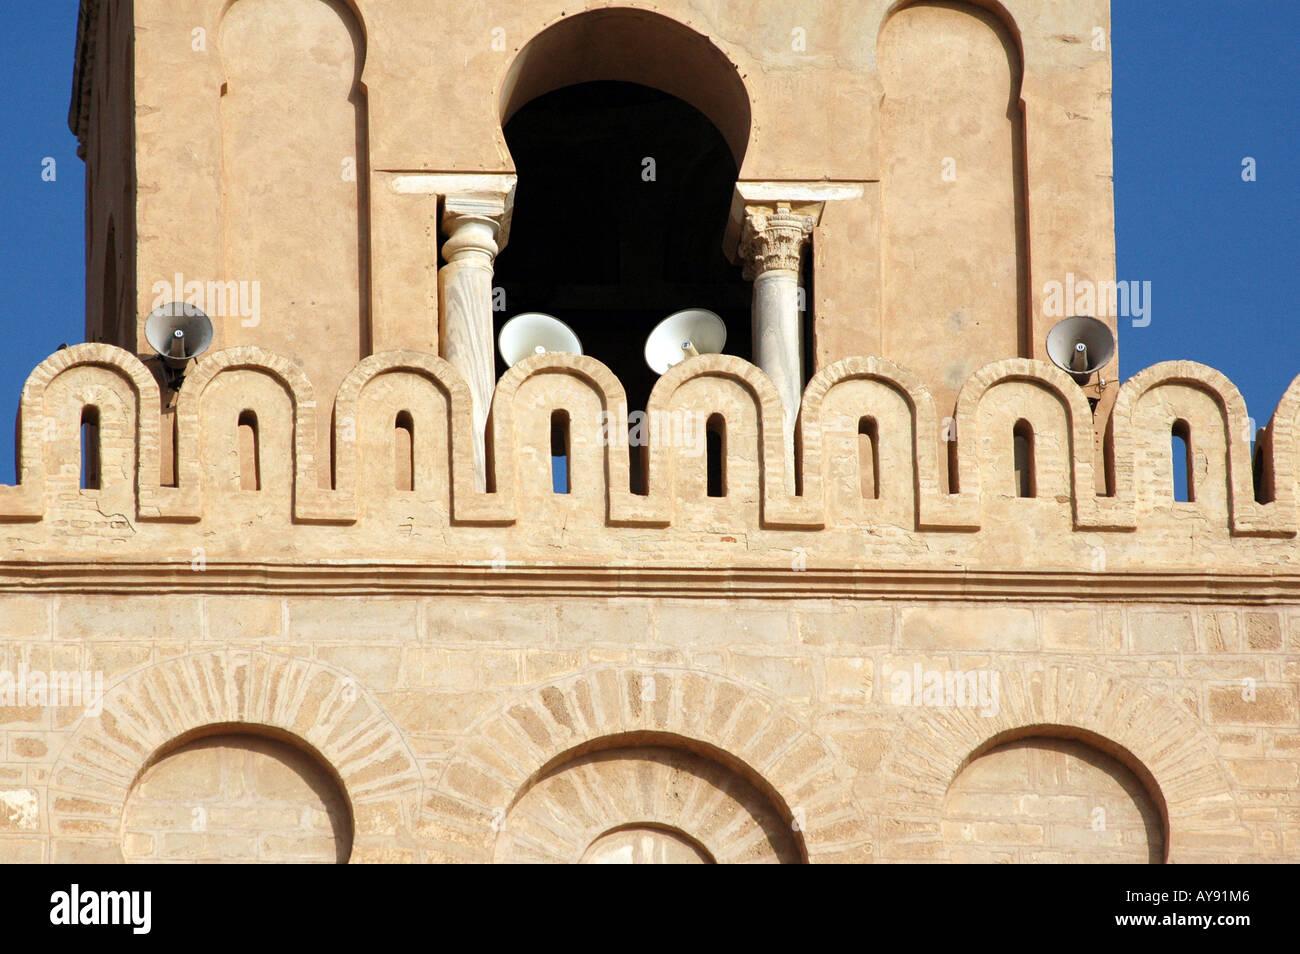 Sidi Okba Mosque also called Great Mosque, Kairouan in Tunisia - Stock Image